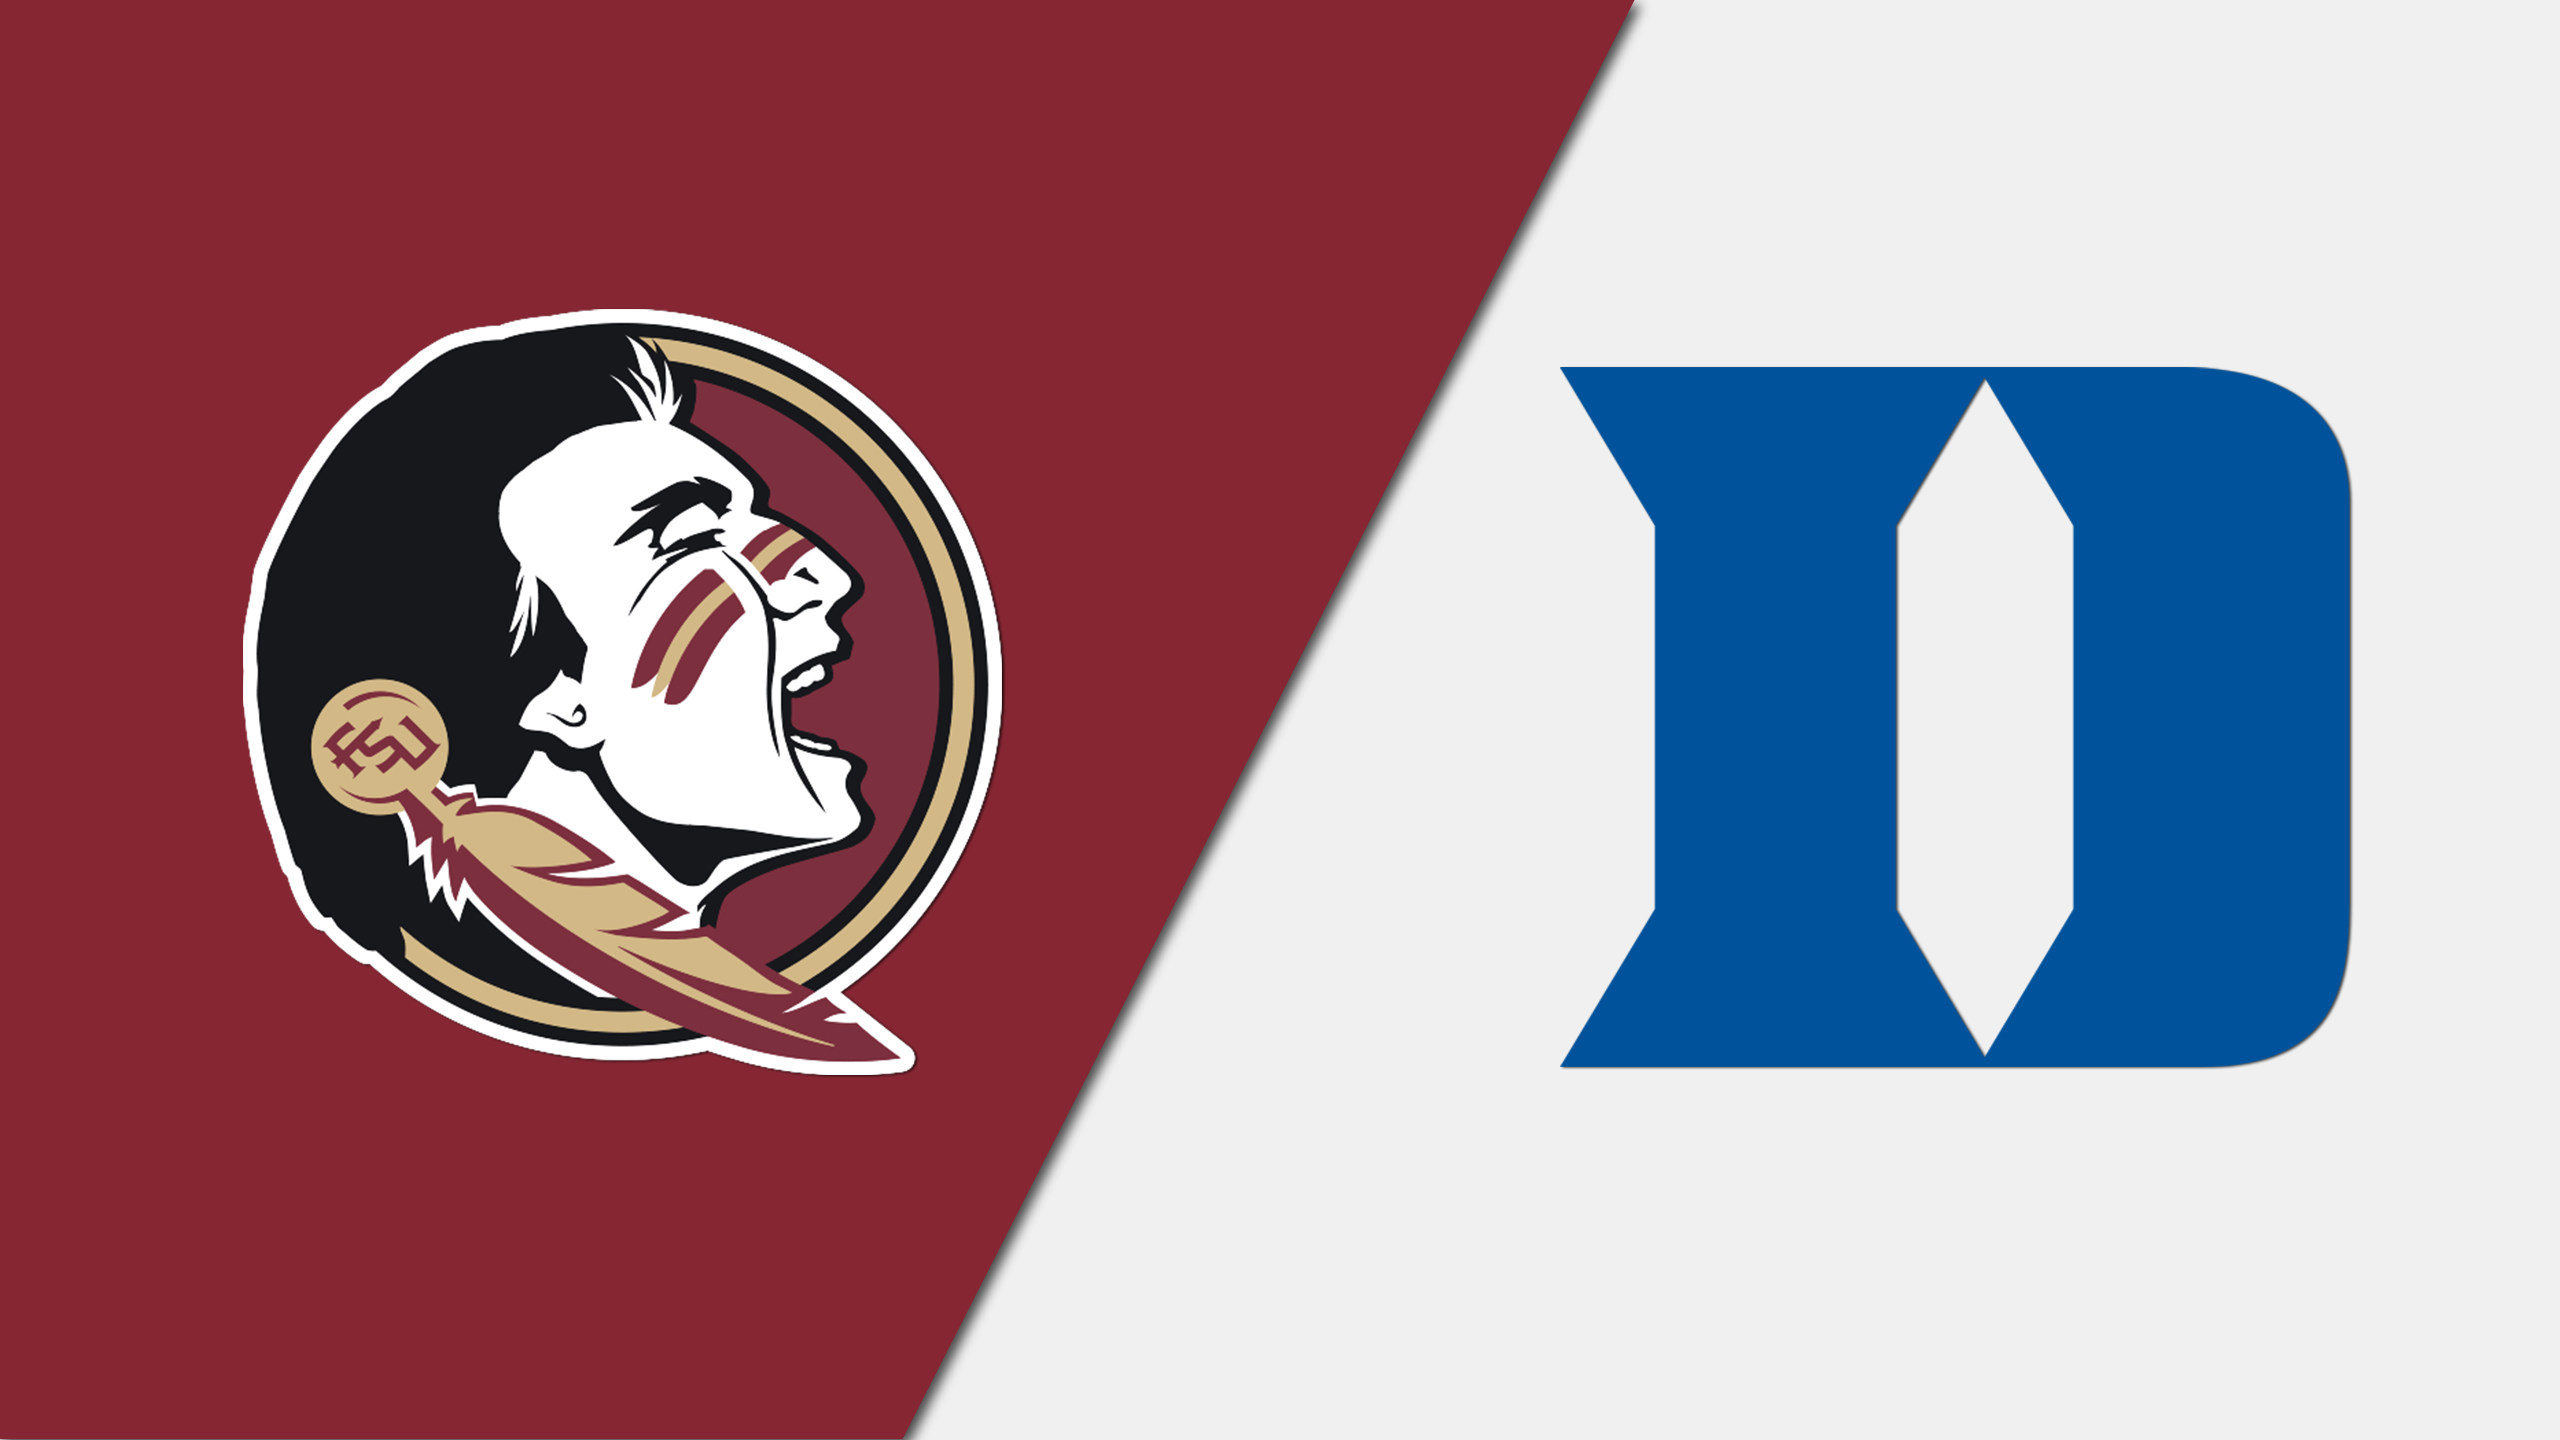 #9 Florida State vs. #5 Duke (Quarterfinal) (ACC Women's Soccer Championship)